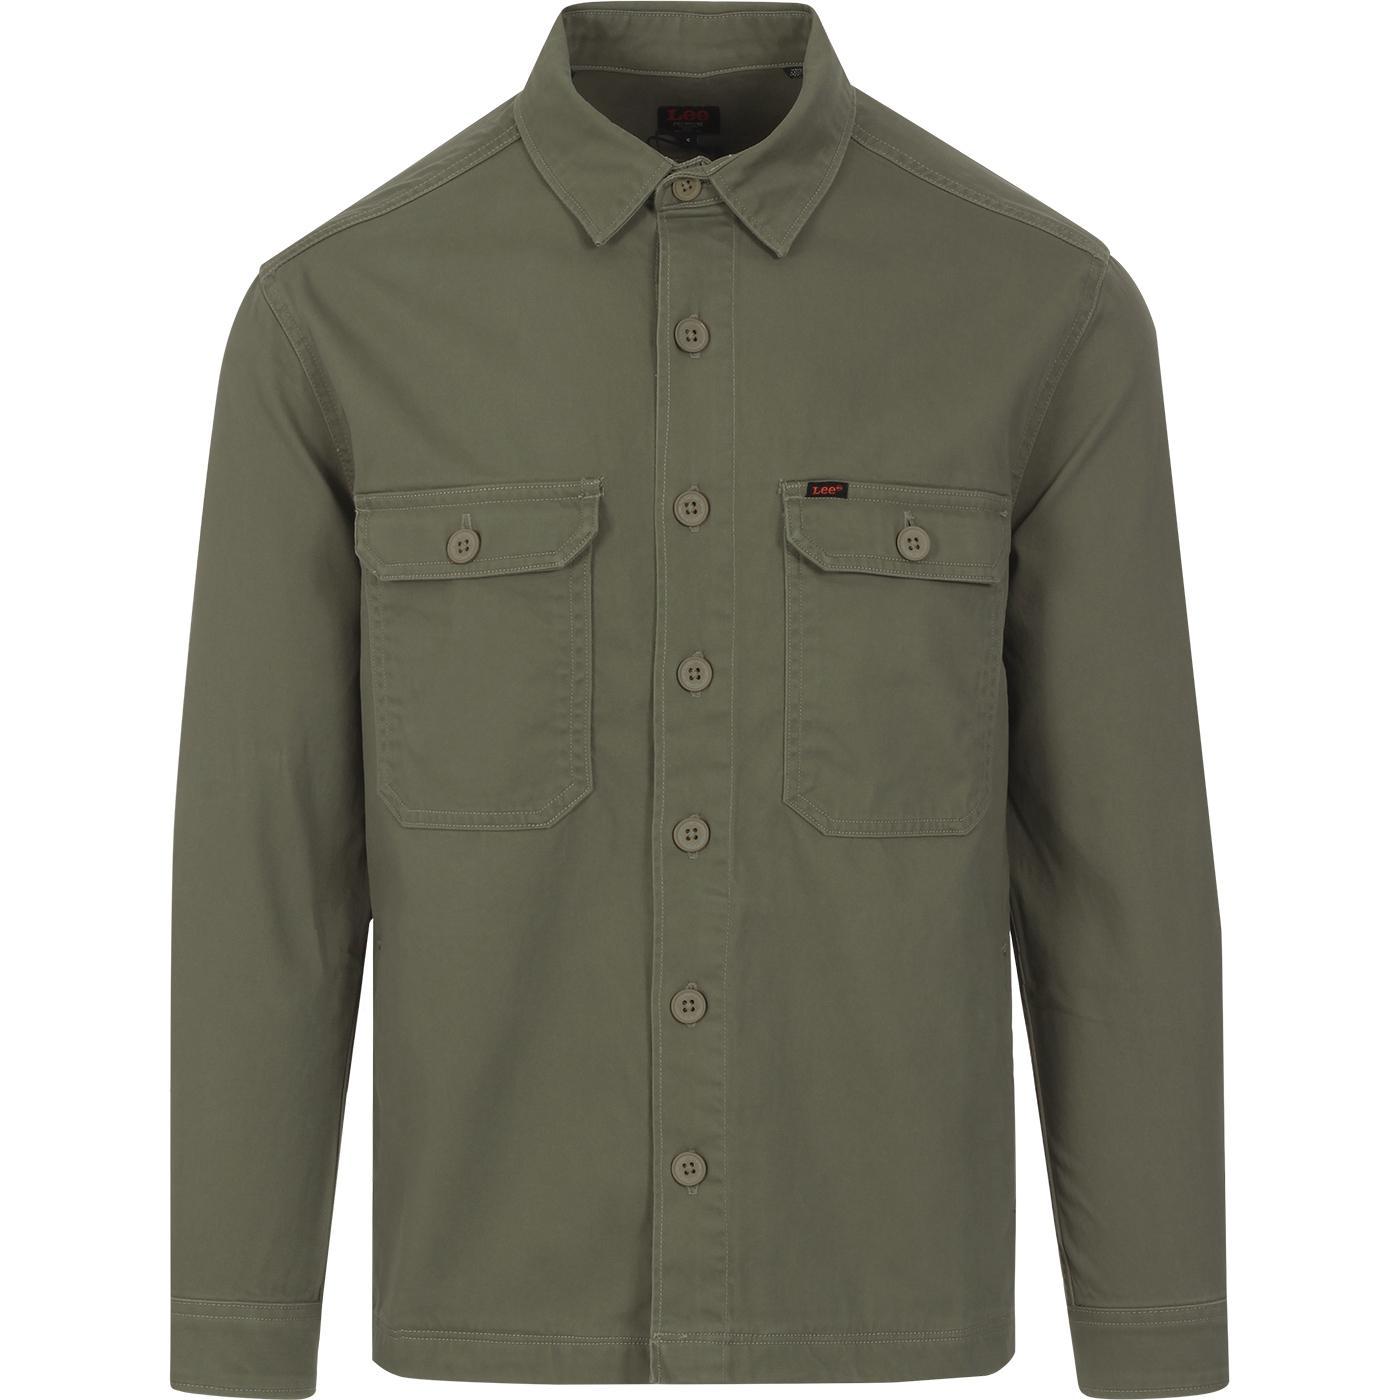 LEE JEANS Retro Mod Workwear Overshirt (Olive)